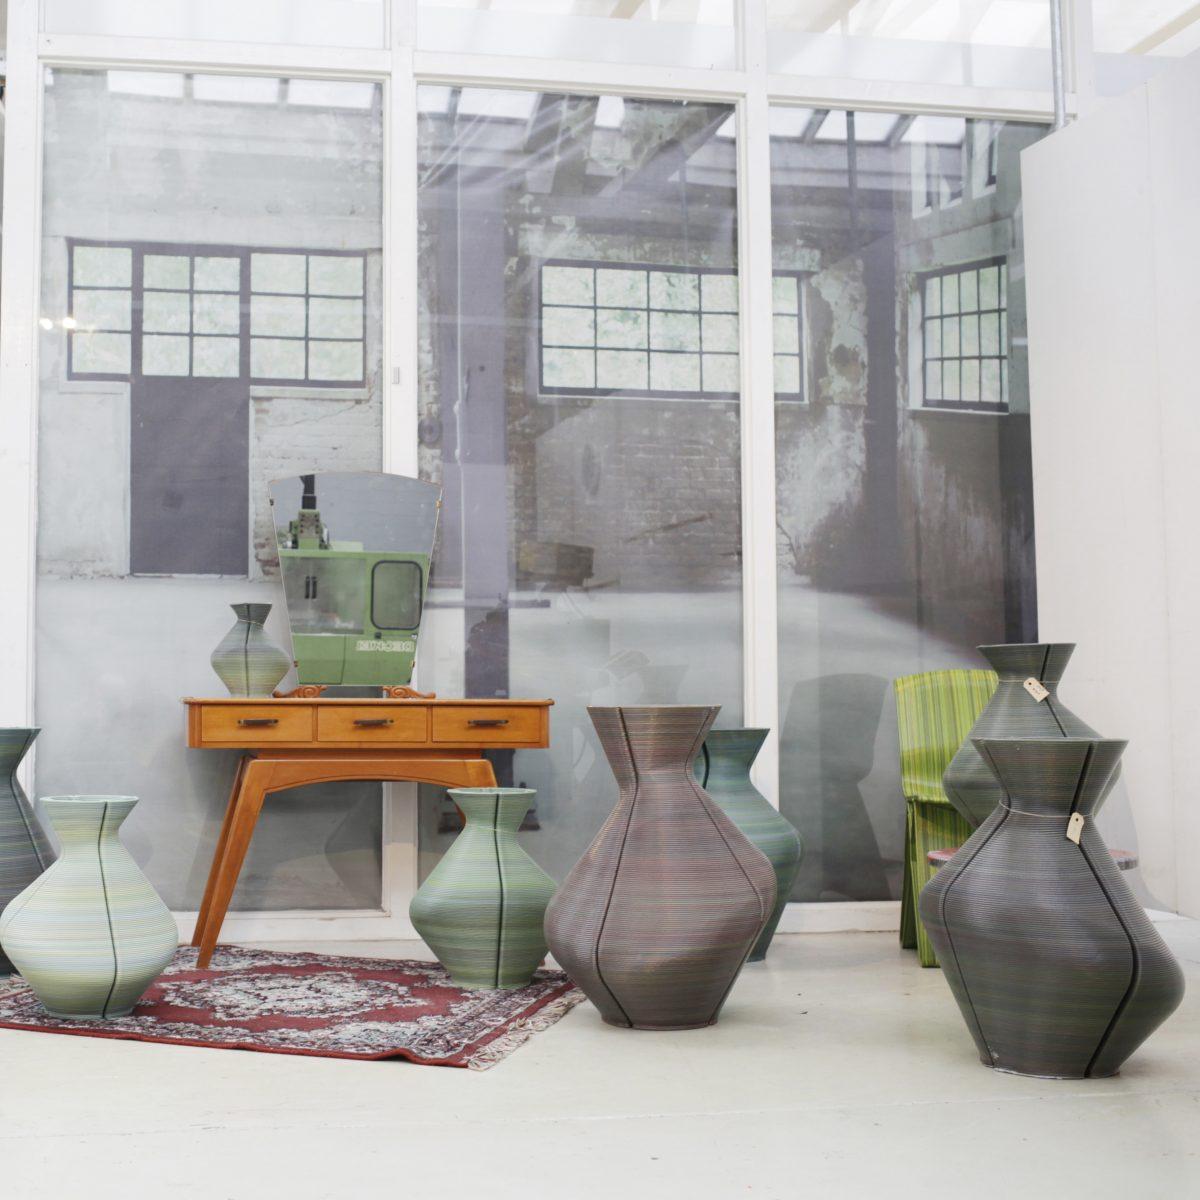 Changing Vases, Random Colored during the Dutch Design Week 2013. Photo Studio Dirk Vander Kooij